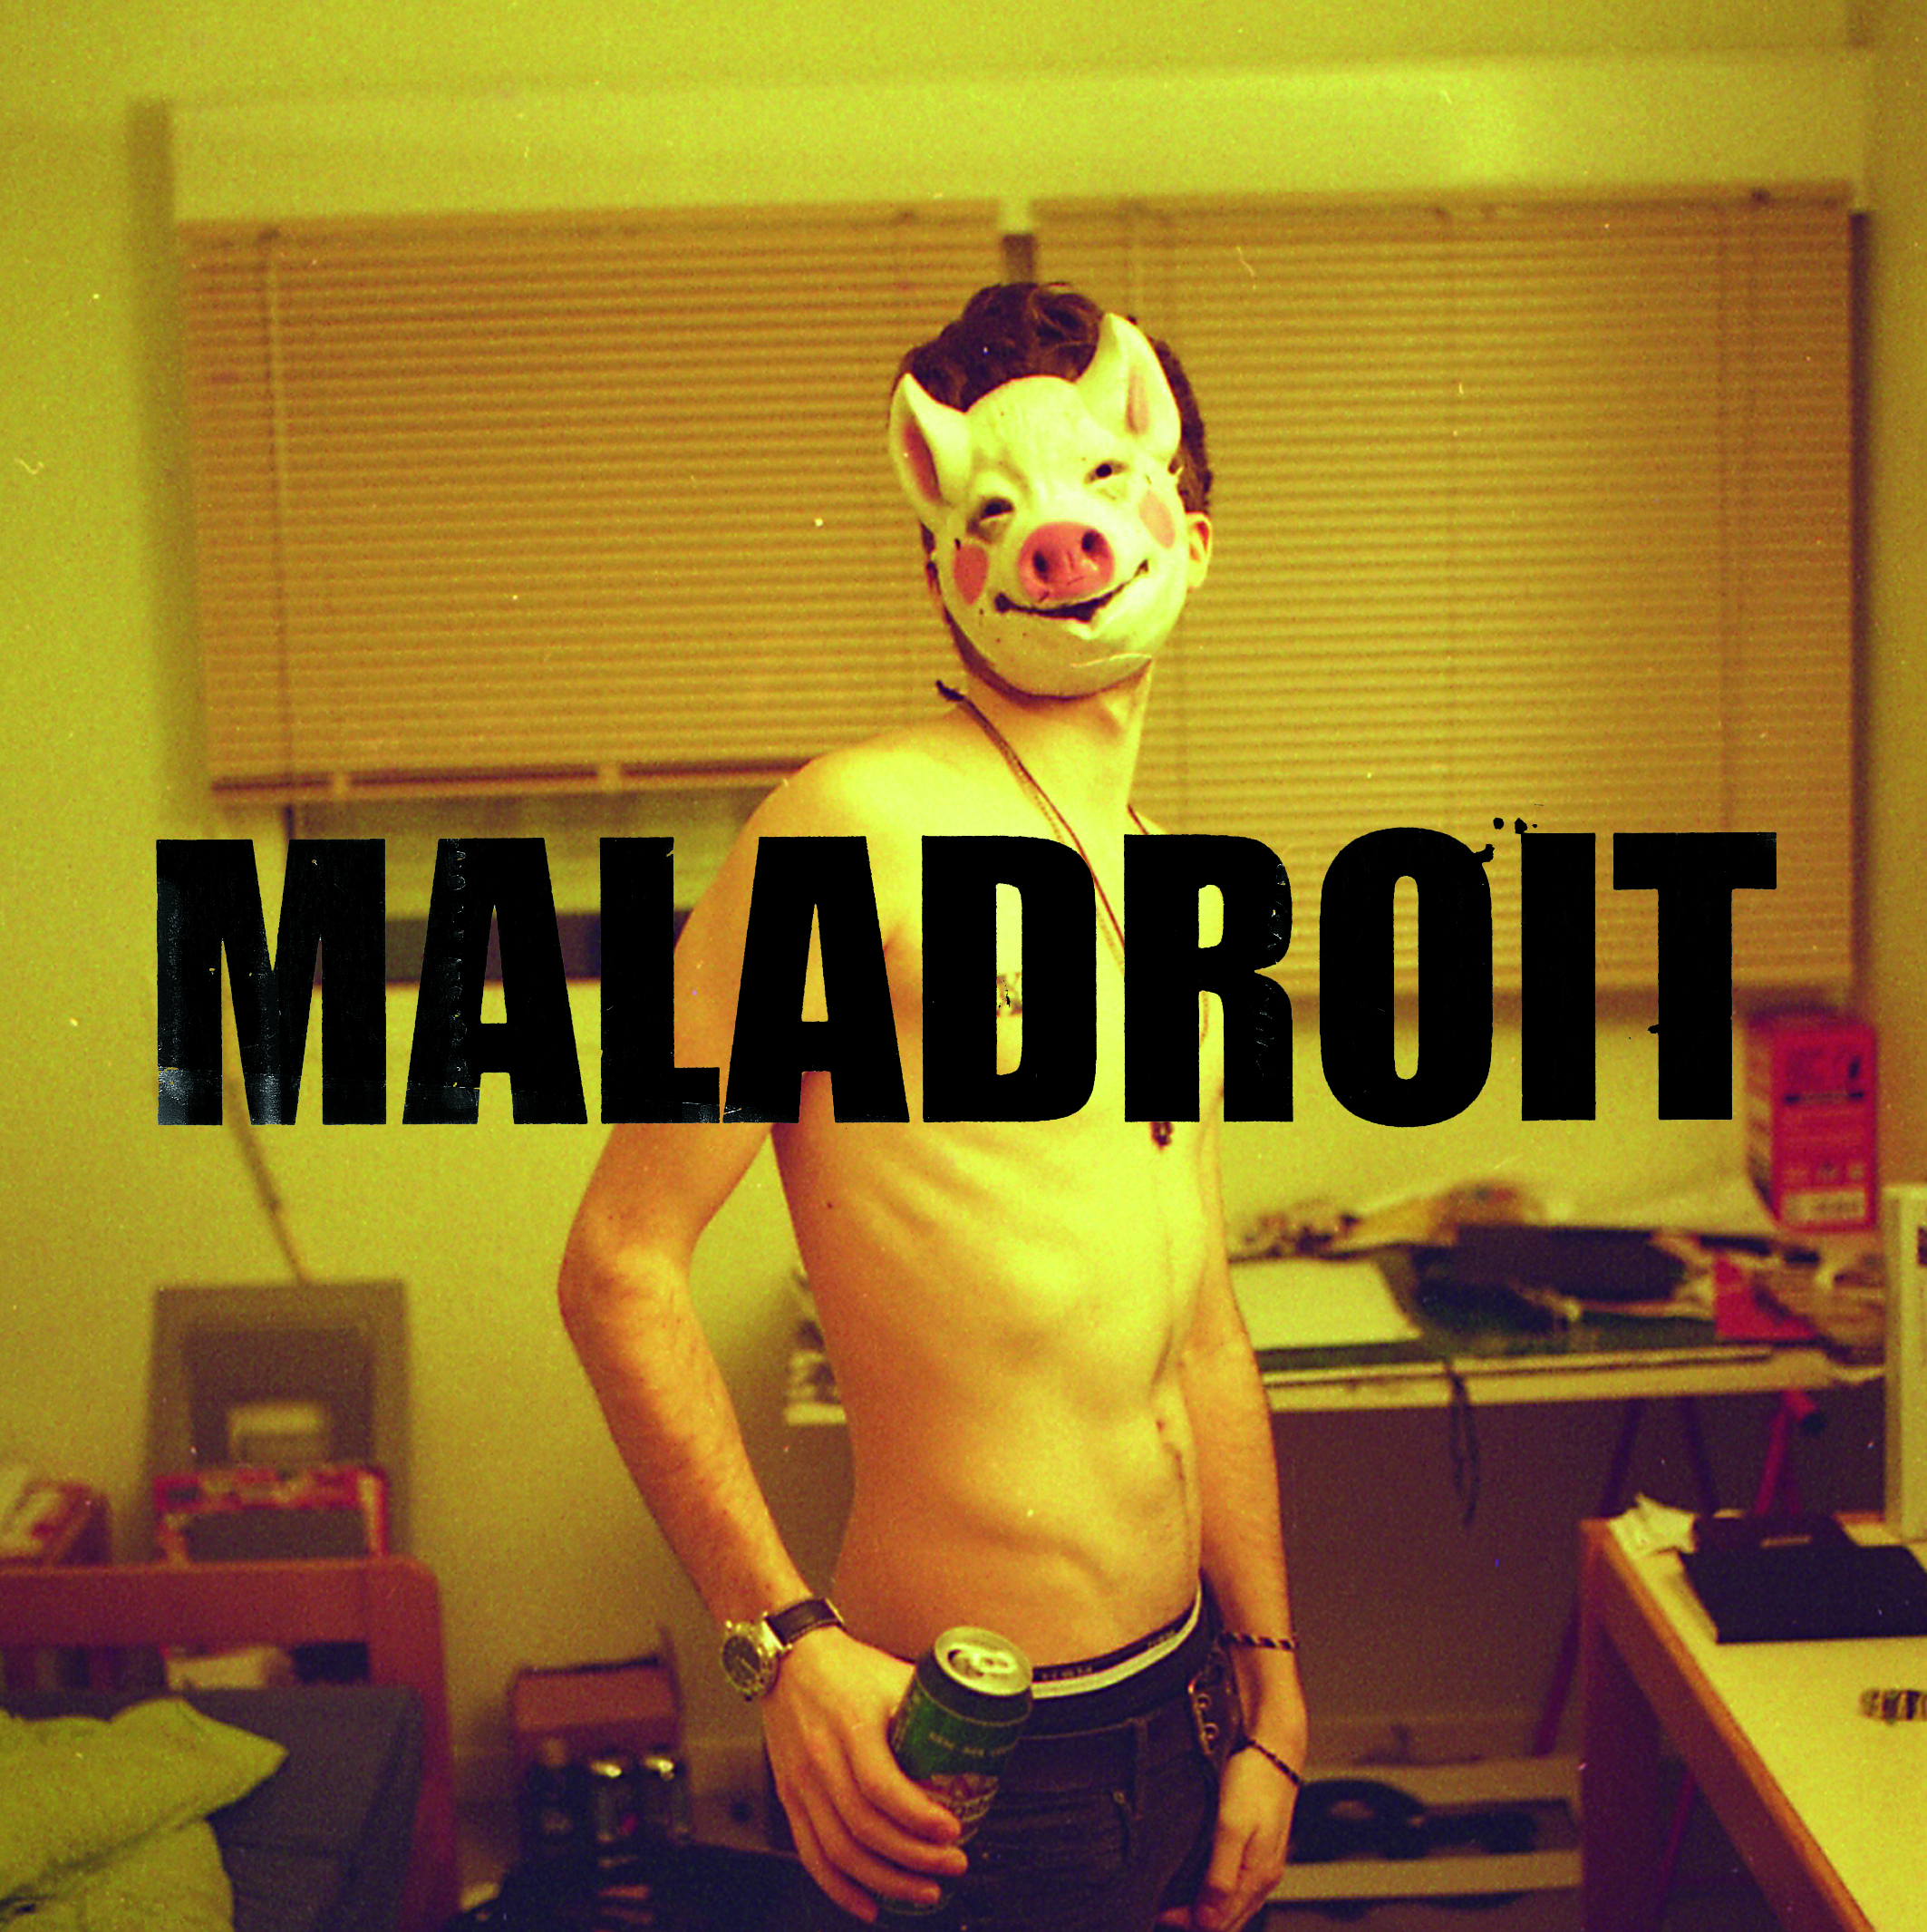 MALADROIT - st